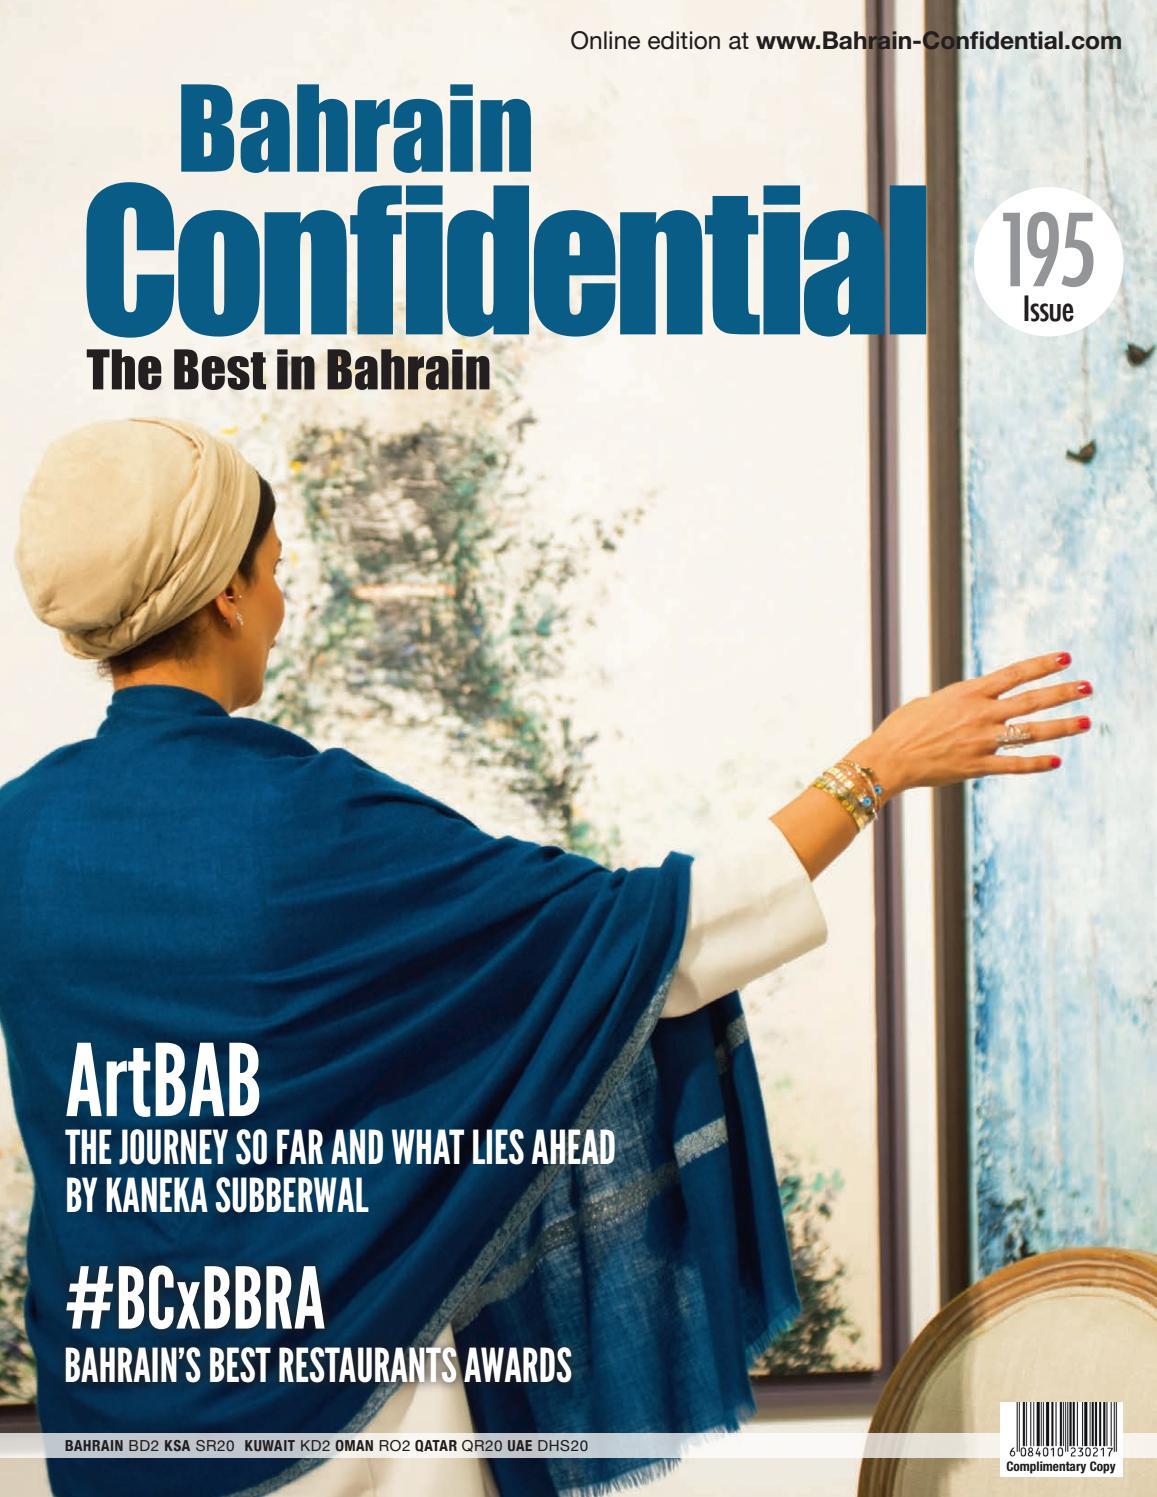 Bahrain Confidential - March 2019 by Arabian Magazines - issuu